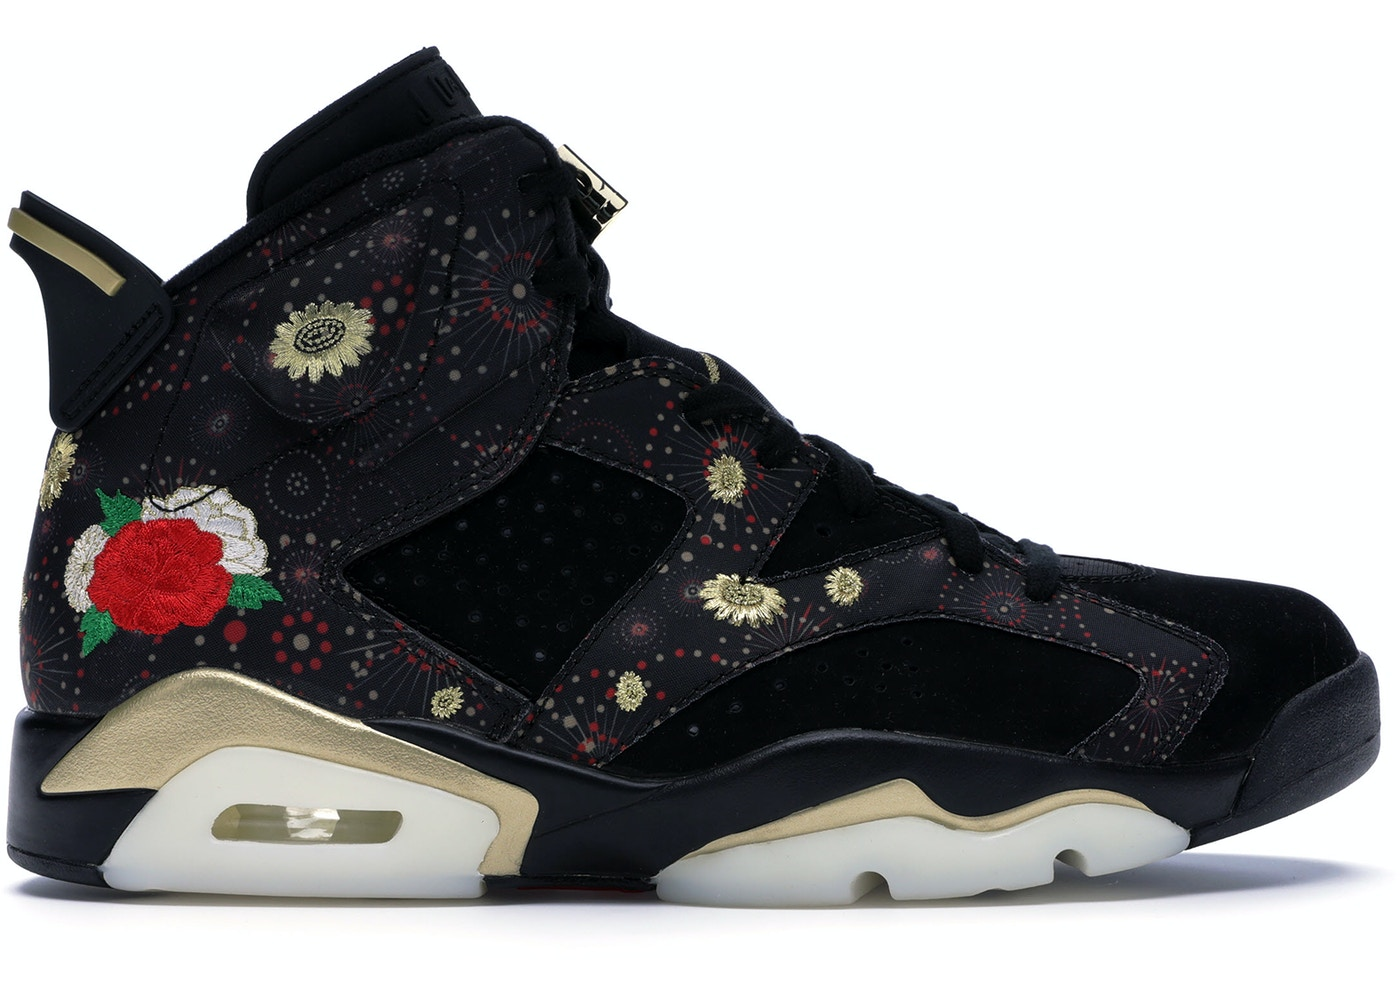 1de79a5ef8f3 Buy Air Jordan 6 Shoes   Deadstock Sneakers